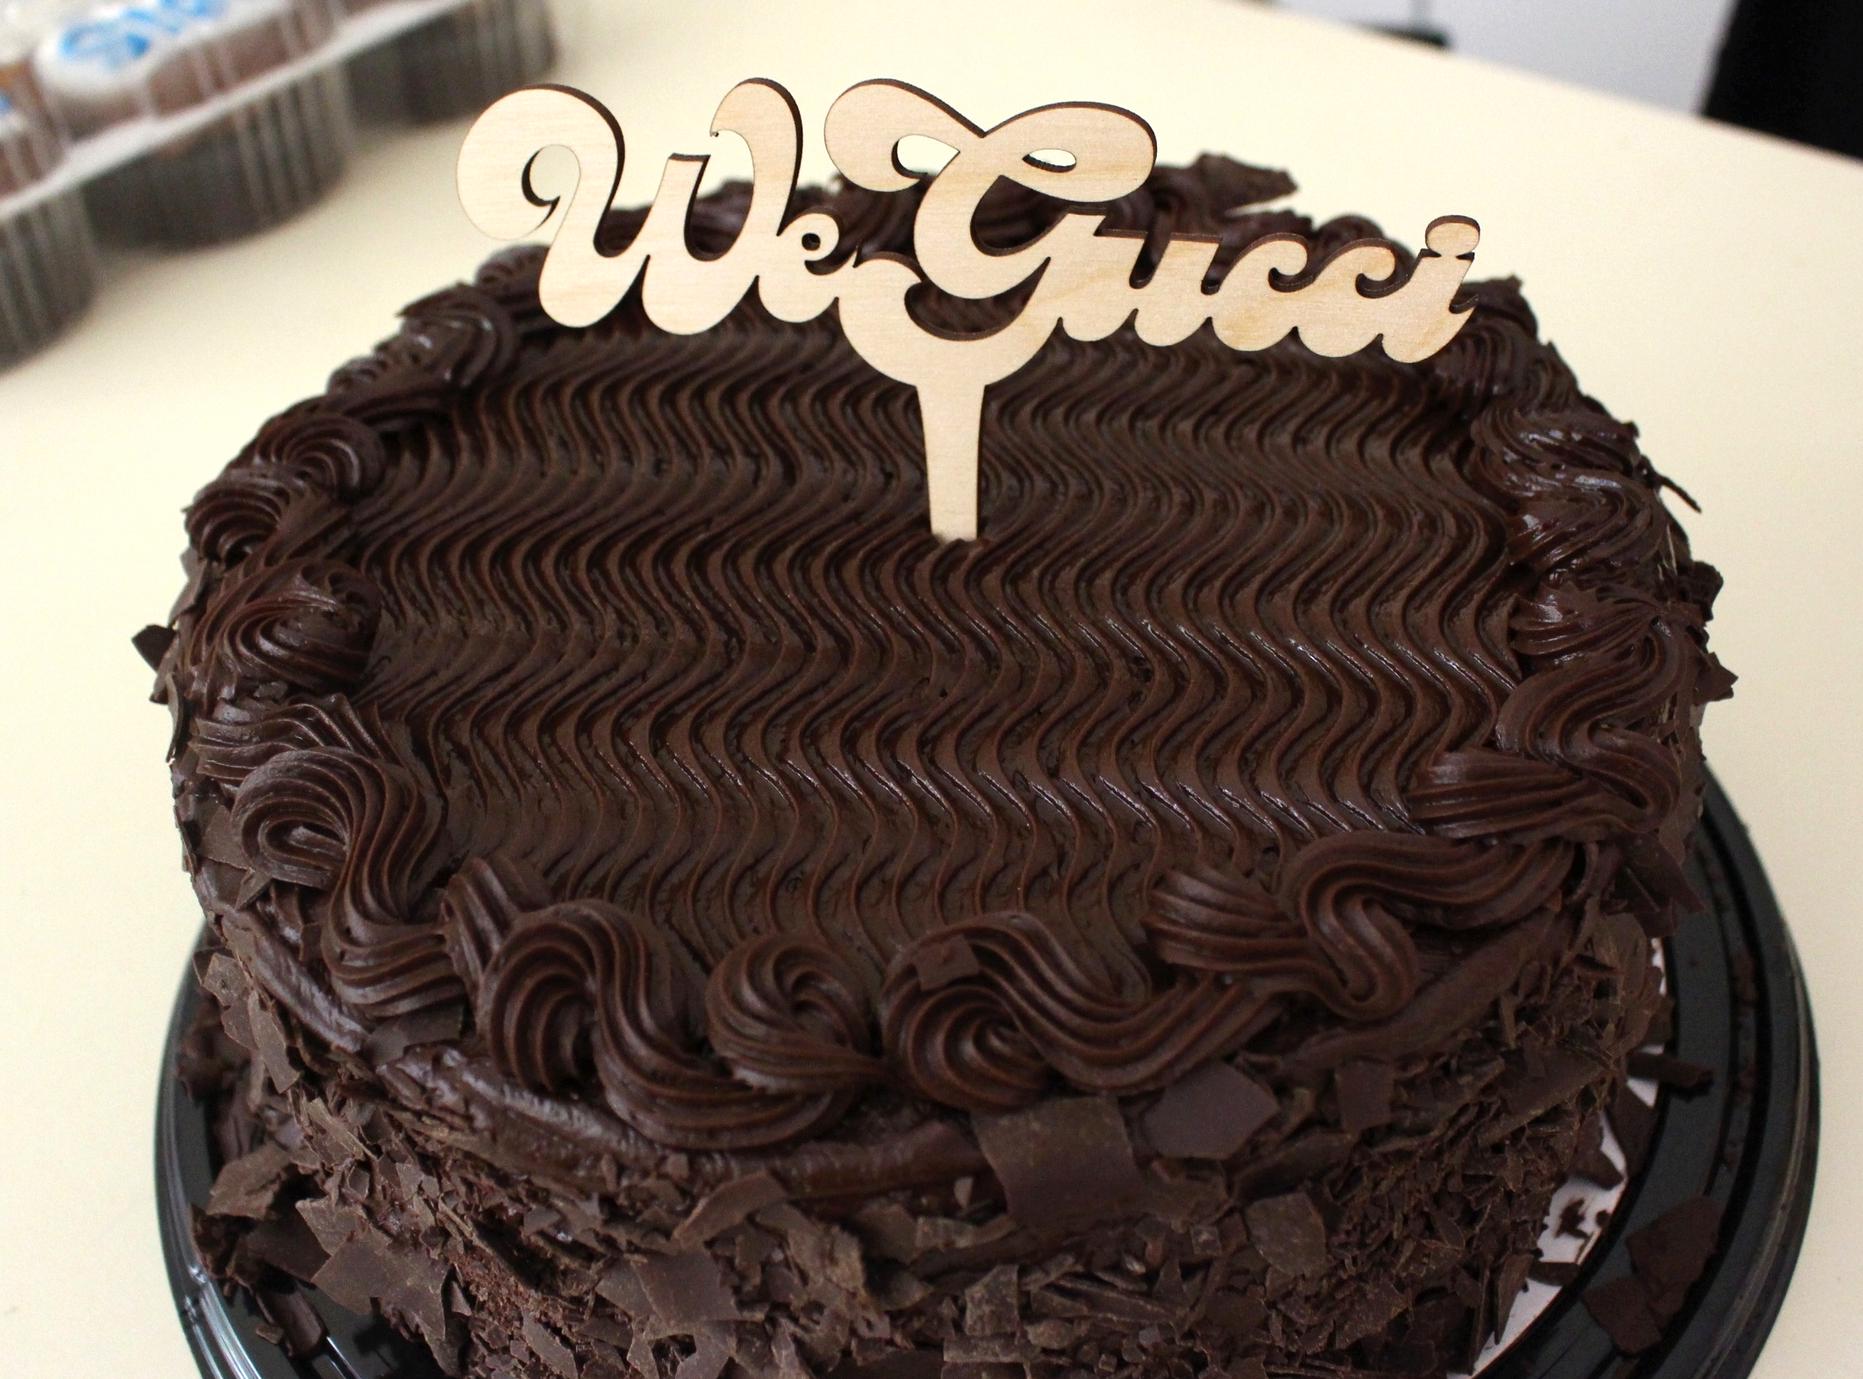 We Gucci -Laser Cut Wood Cake Topper